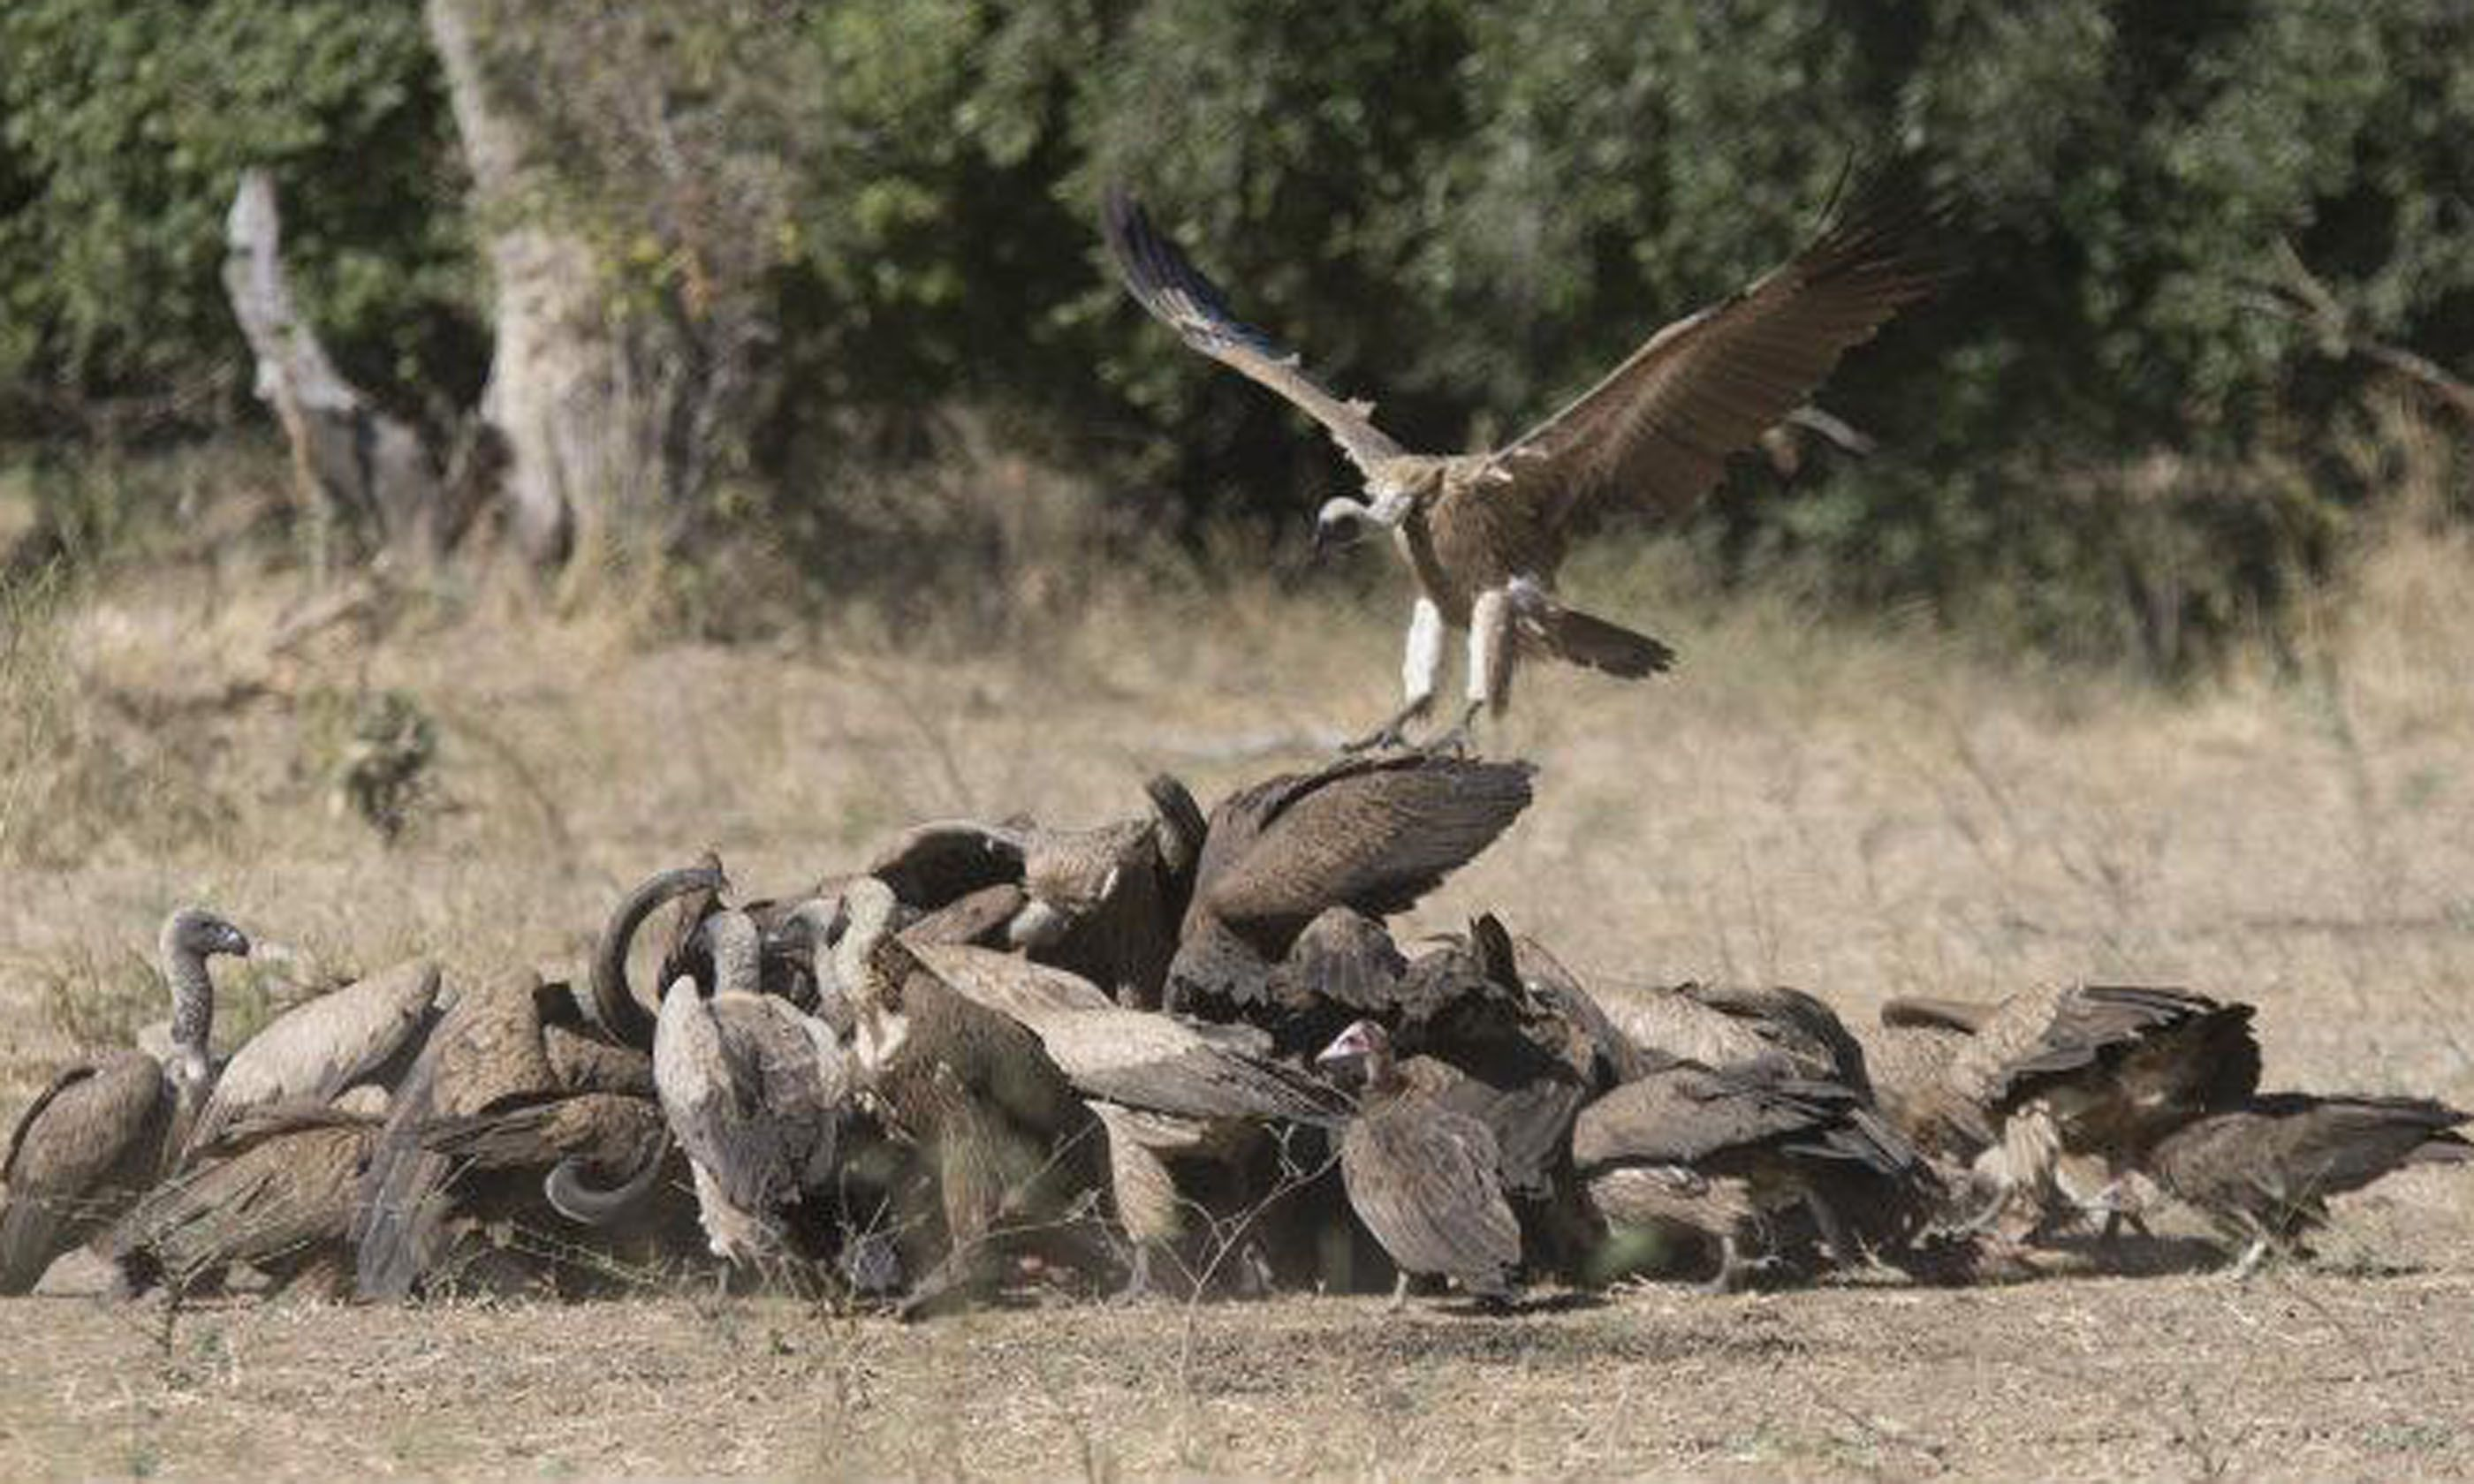 Vultures feeding on a kudu carcass (Edwina Cagol)